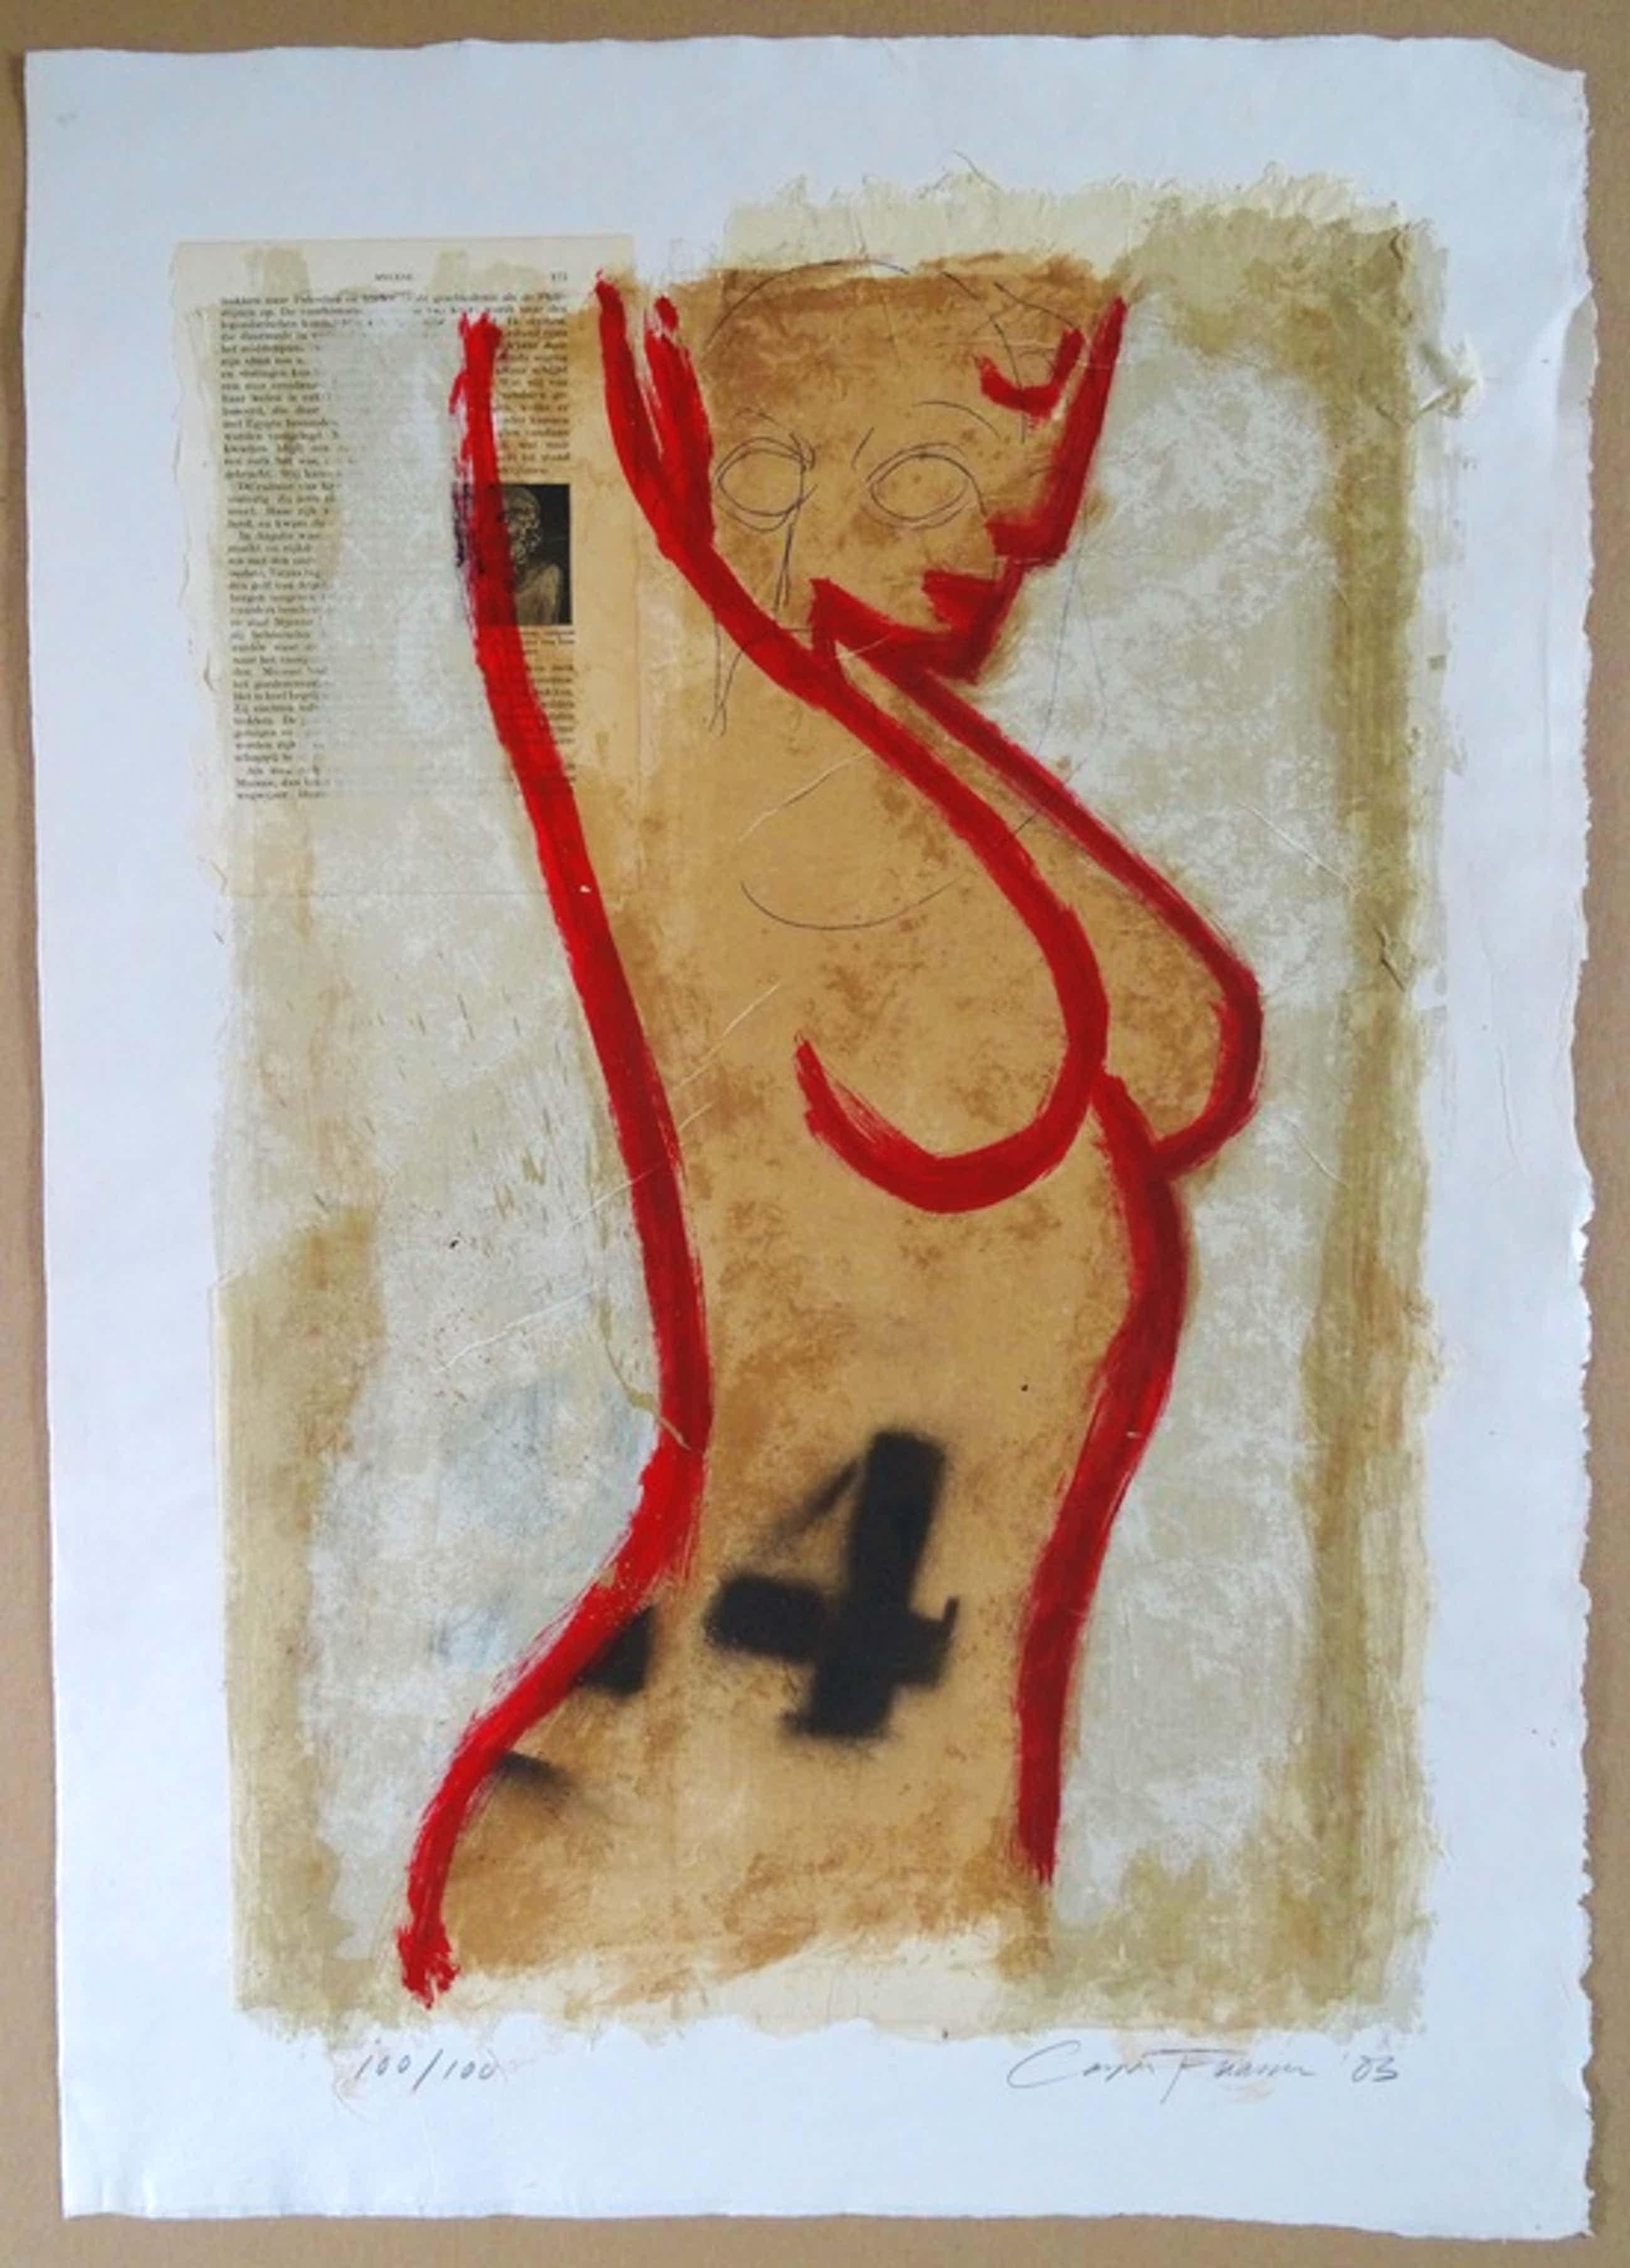 Casper Faassen, Zeefdruk / Collage, ''Desnudo'' kopen? Bied vanaf 240!